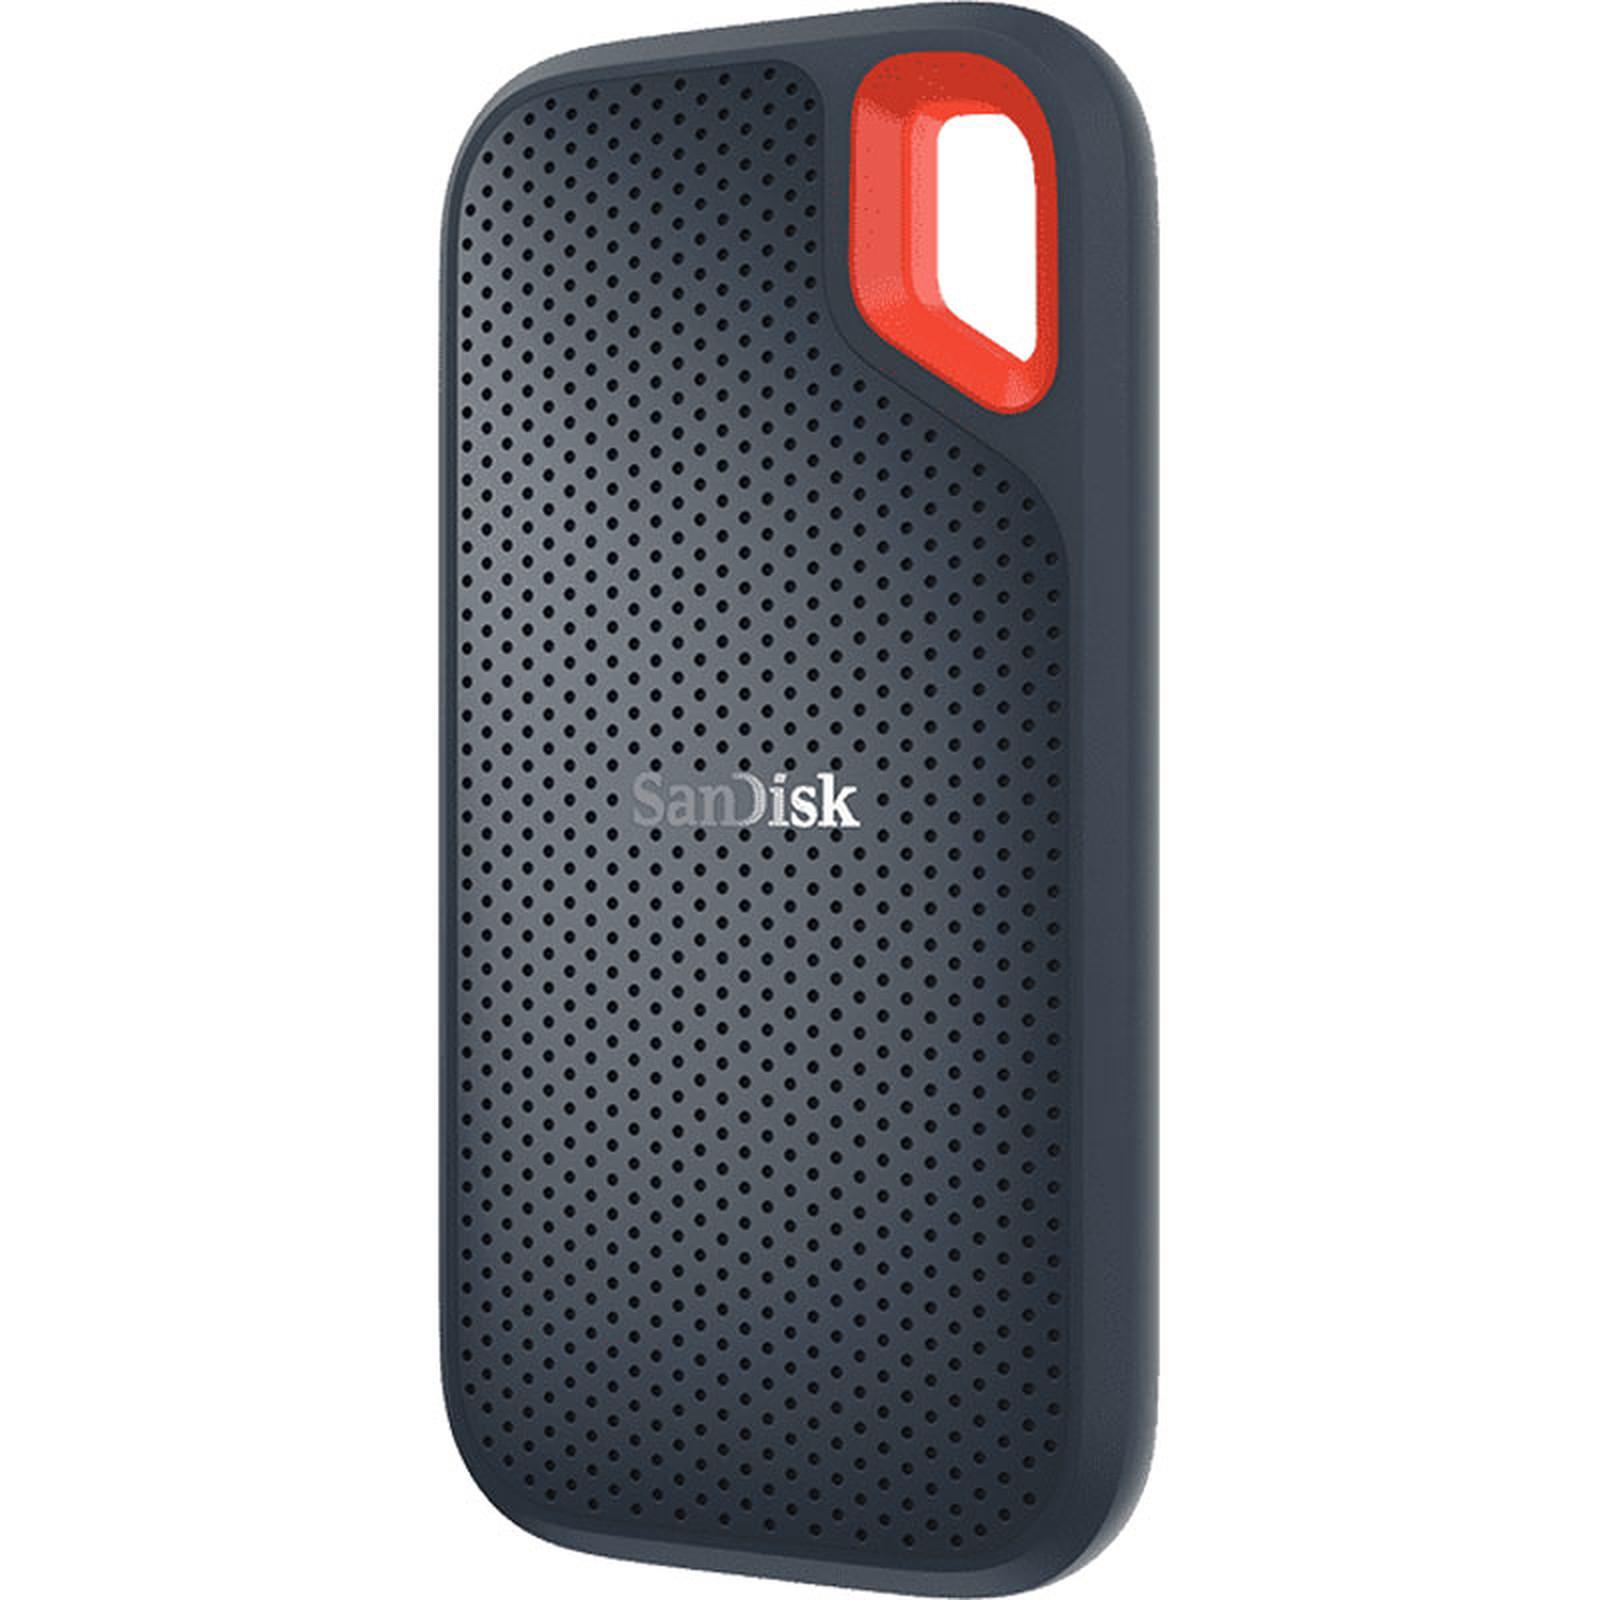 SanDisk Extreme Portable SSD 250 Go